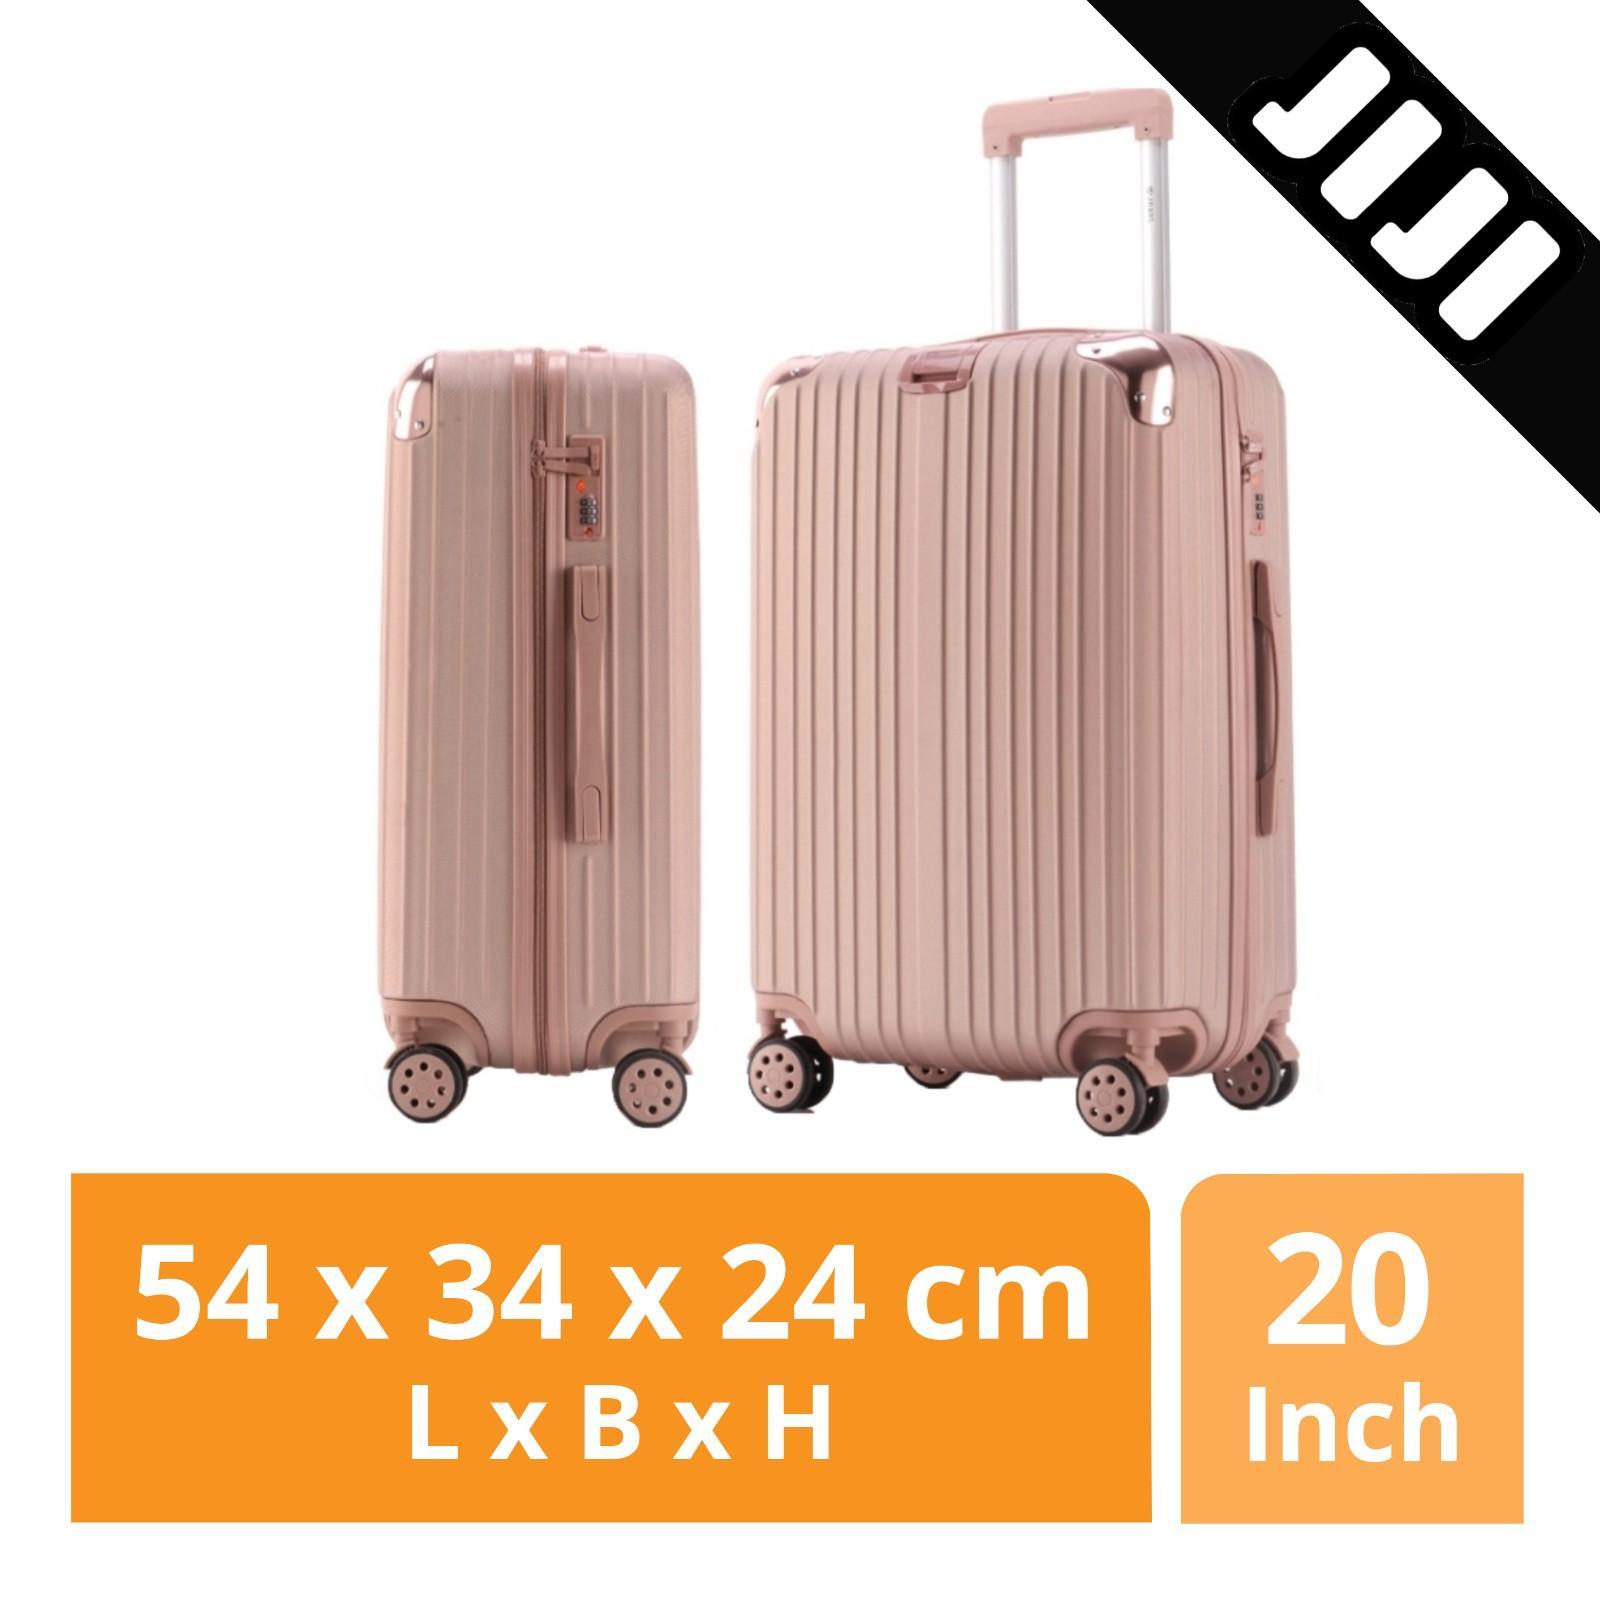 Jiji Premium Luggage 20/24/28 Inch - Travel Bags / Hard Shell / Best Value (sg) By Jiji.